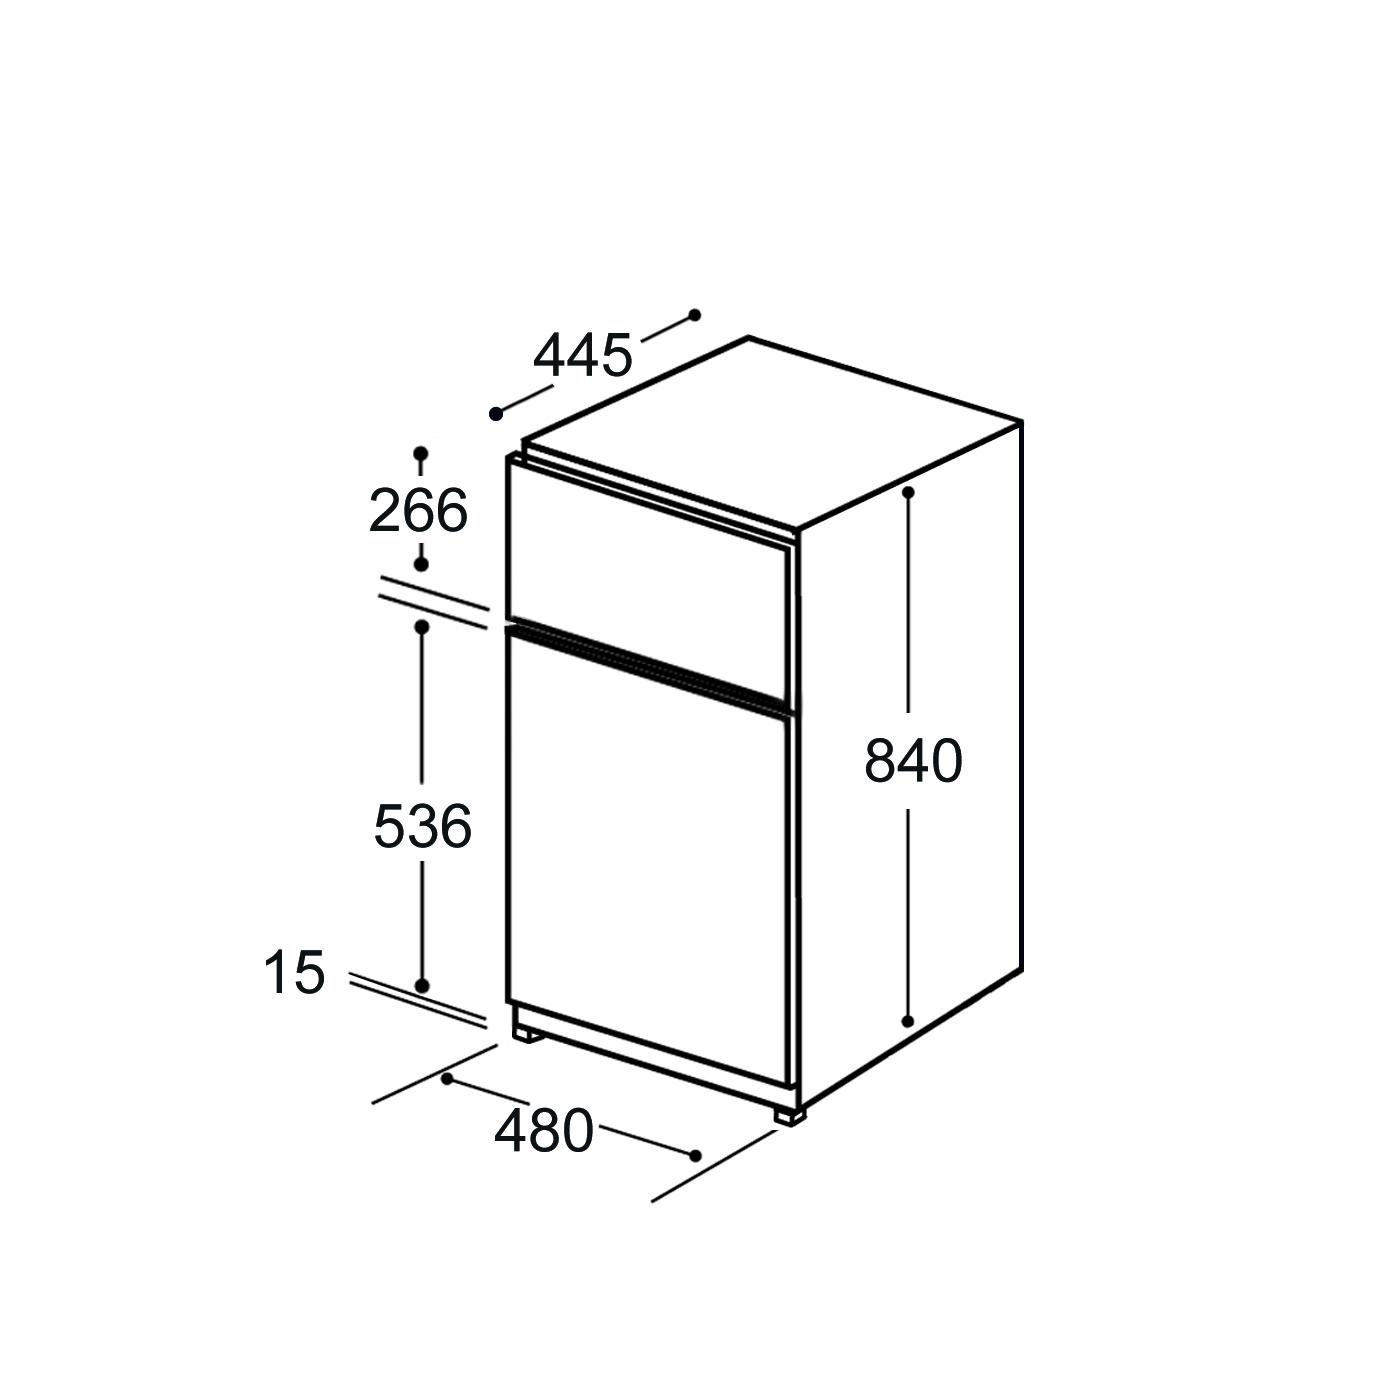 FD1714 48cm freestanding undercounter double door fridge freezer, white Alternative (0)